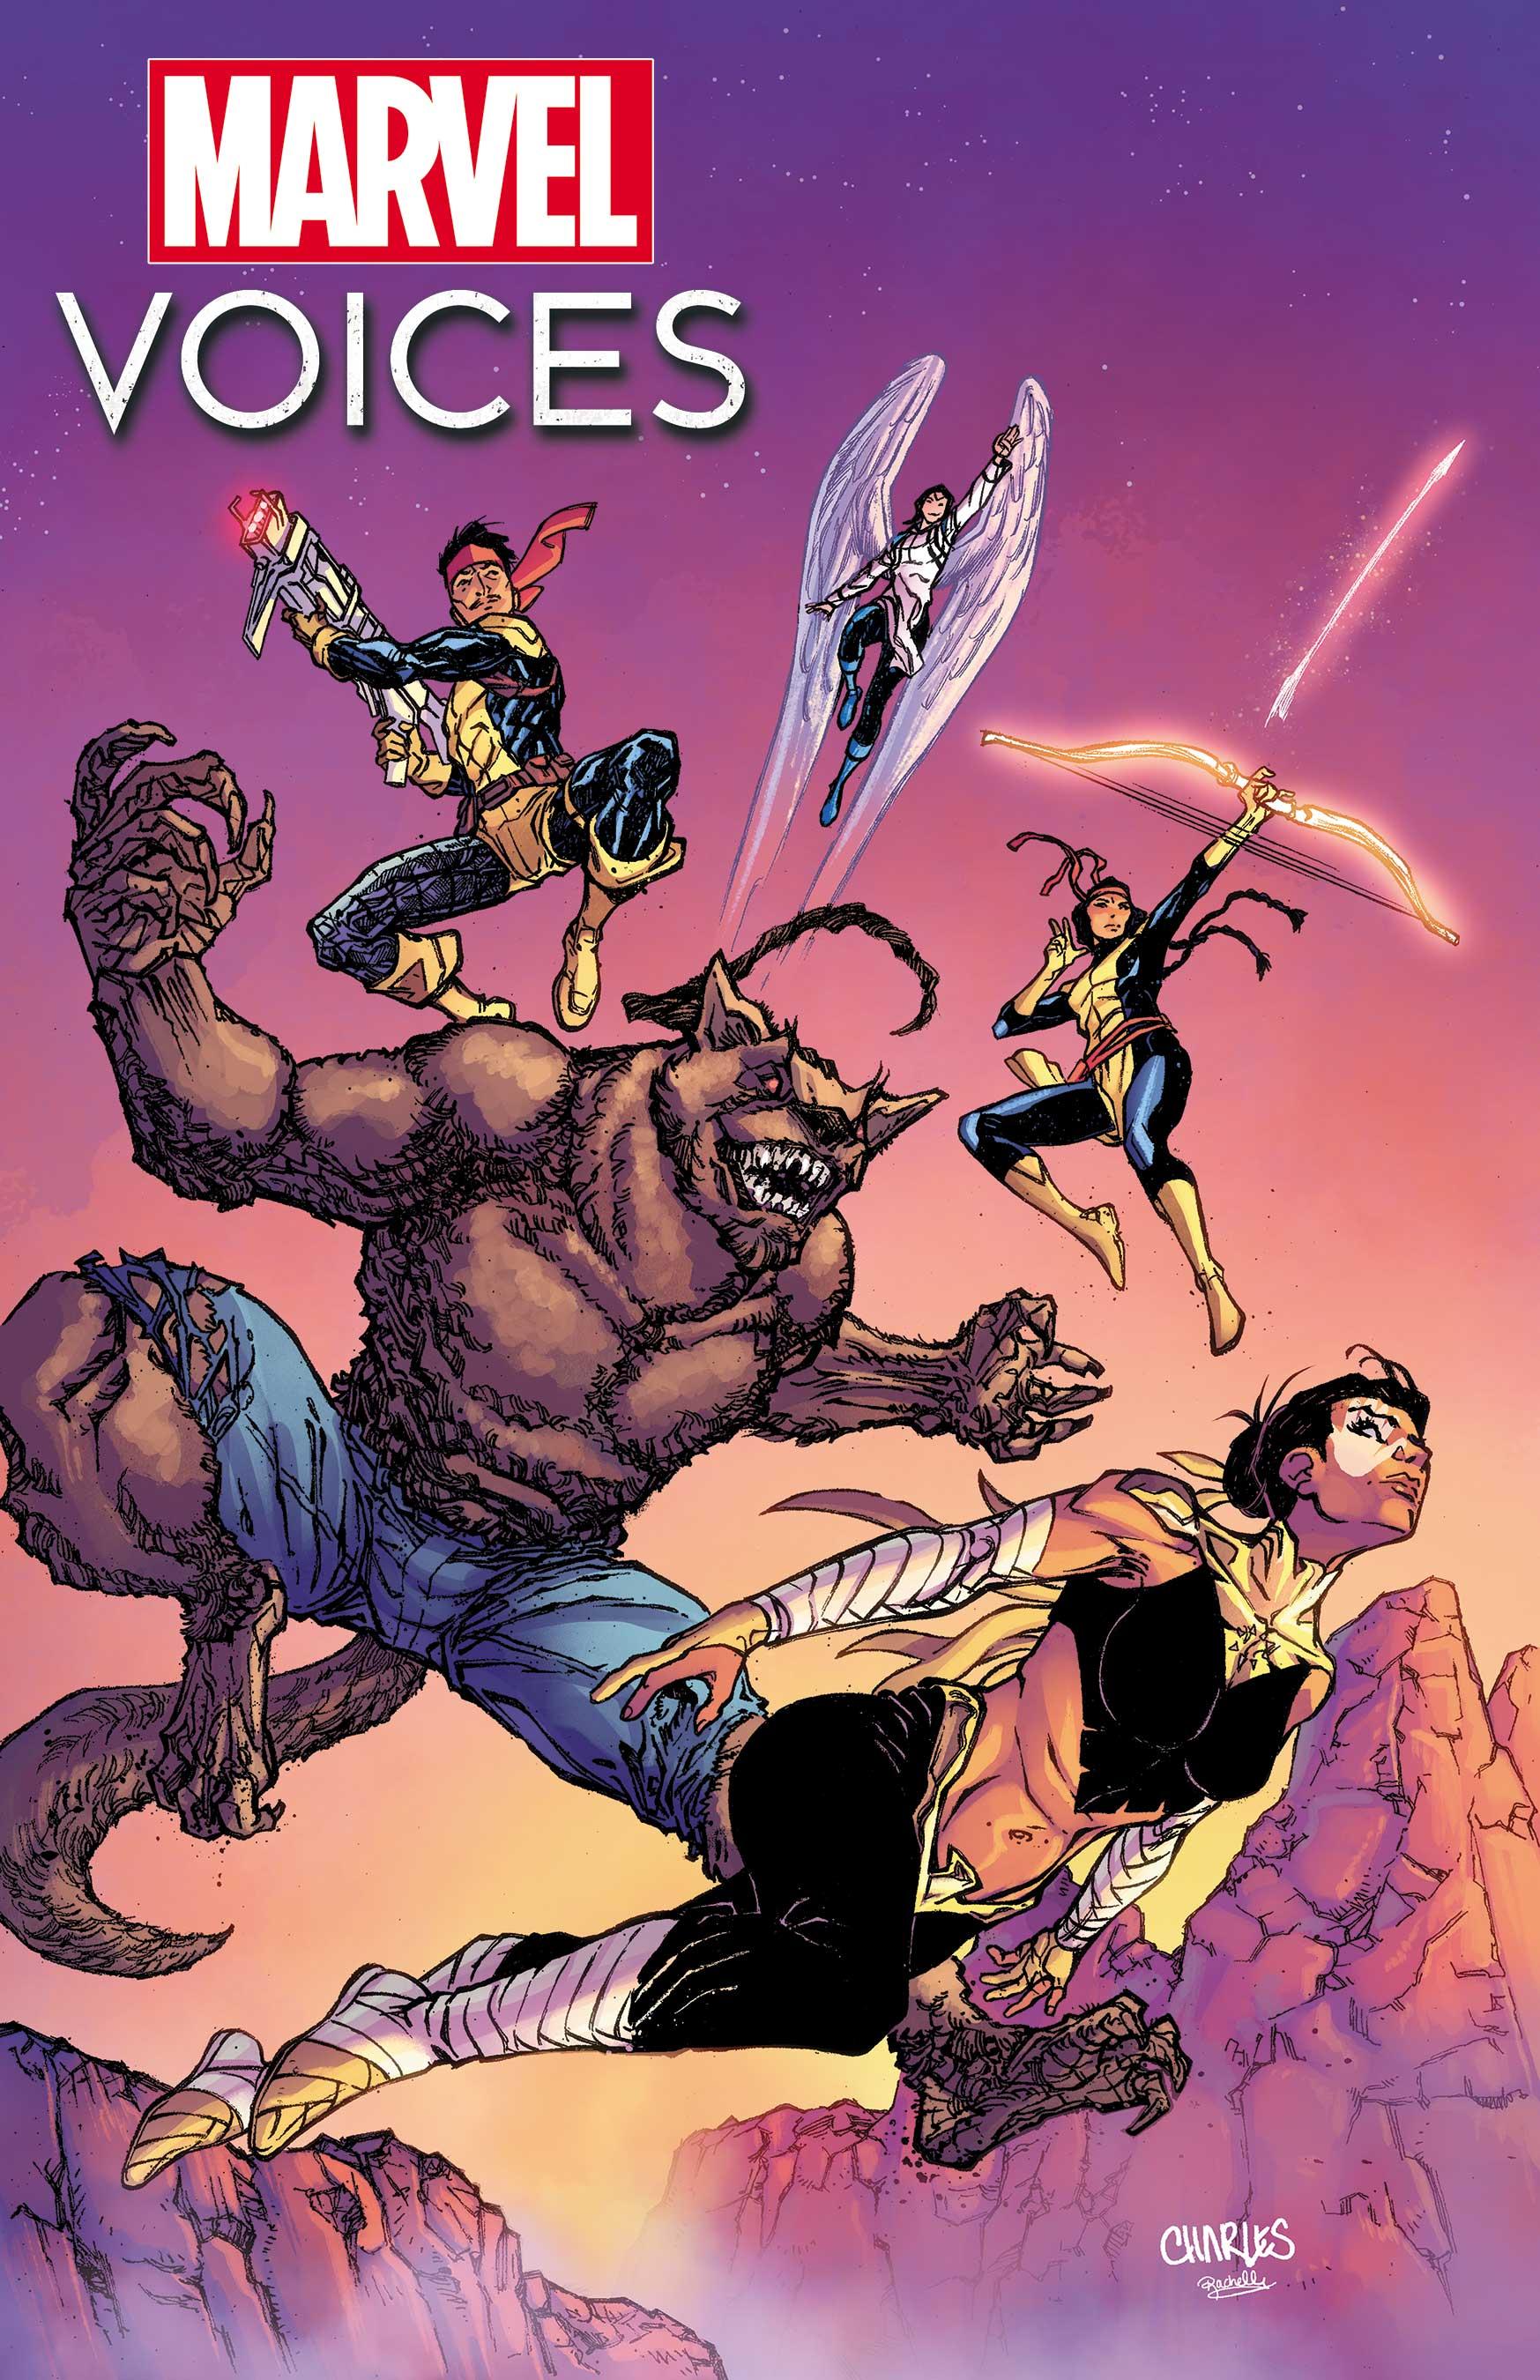 Marvel's Voices: Comunidades (2021) #1